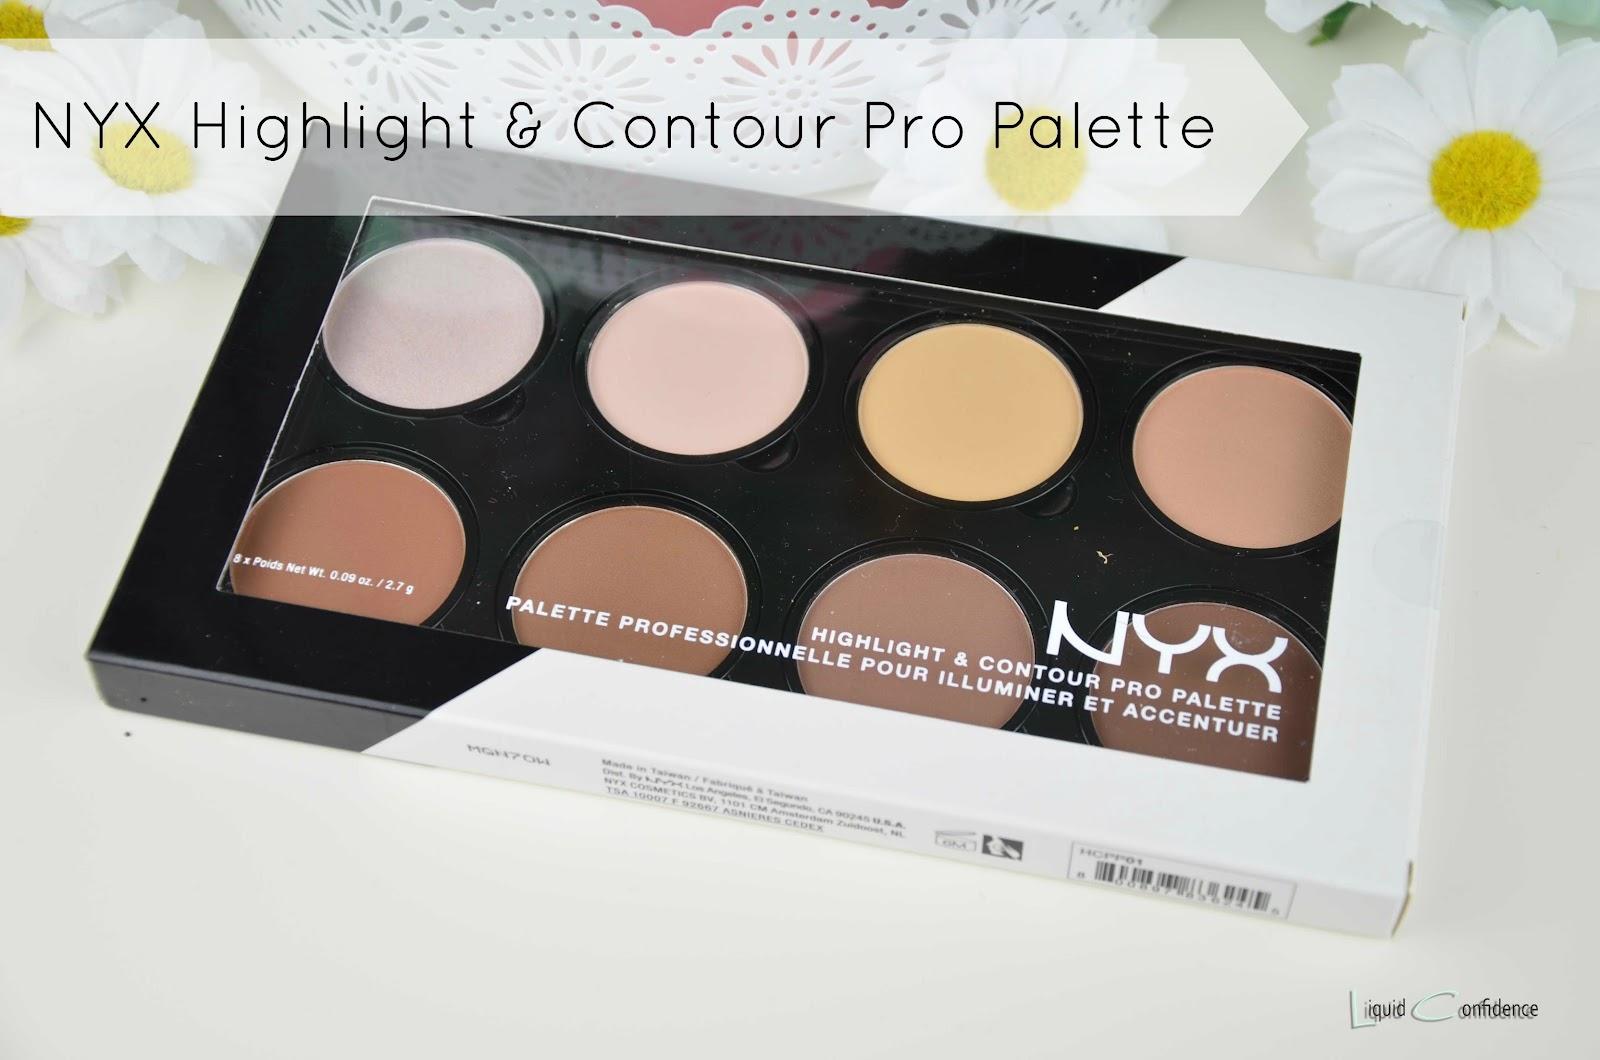 review nyx highlight contour pro palette liquid. Black Bedroom Furniture Sets. Home Design Ideas